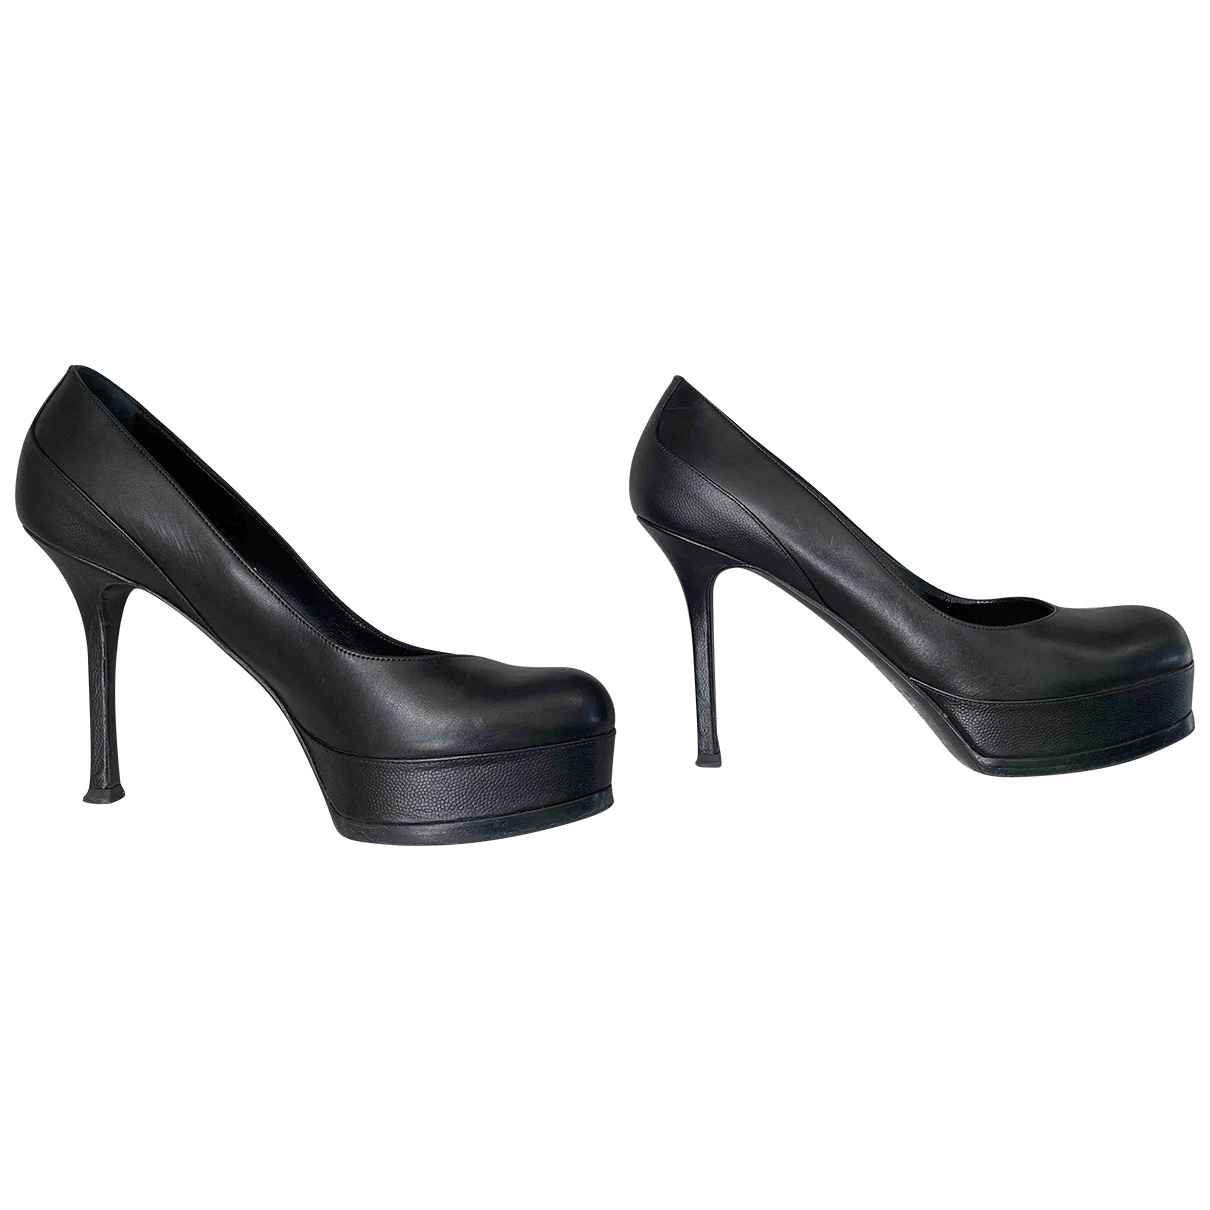 Saint Laurent \N Black Leather Heels for Women 37.5 EU